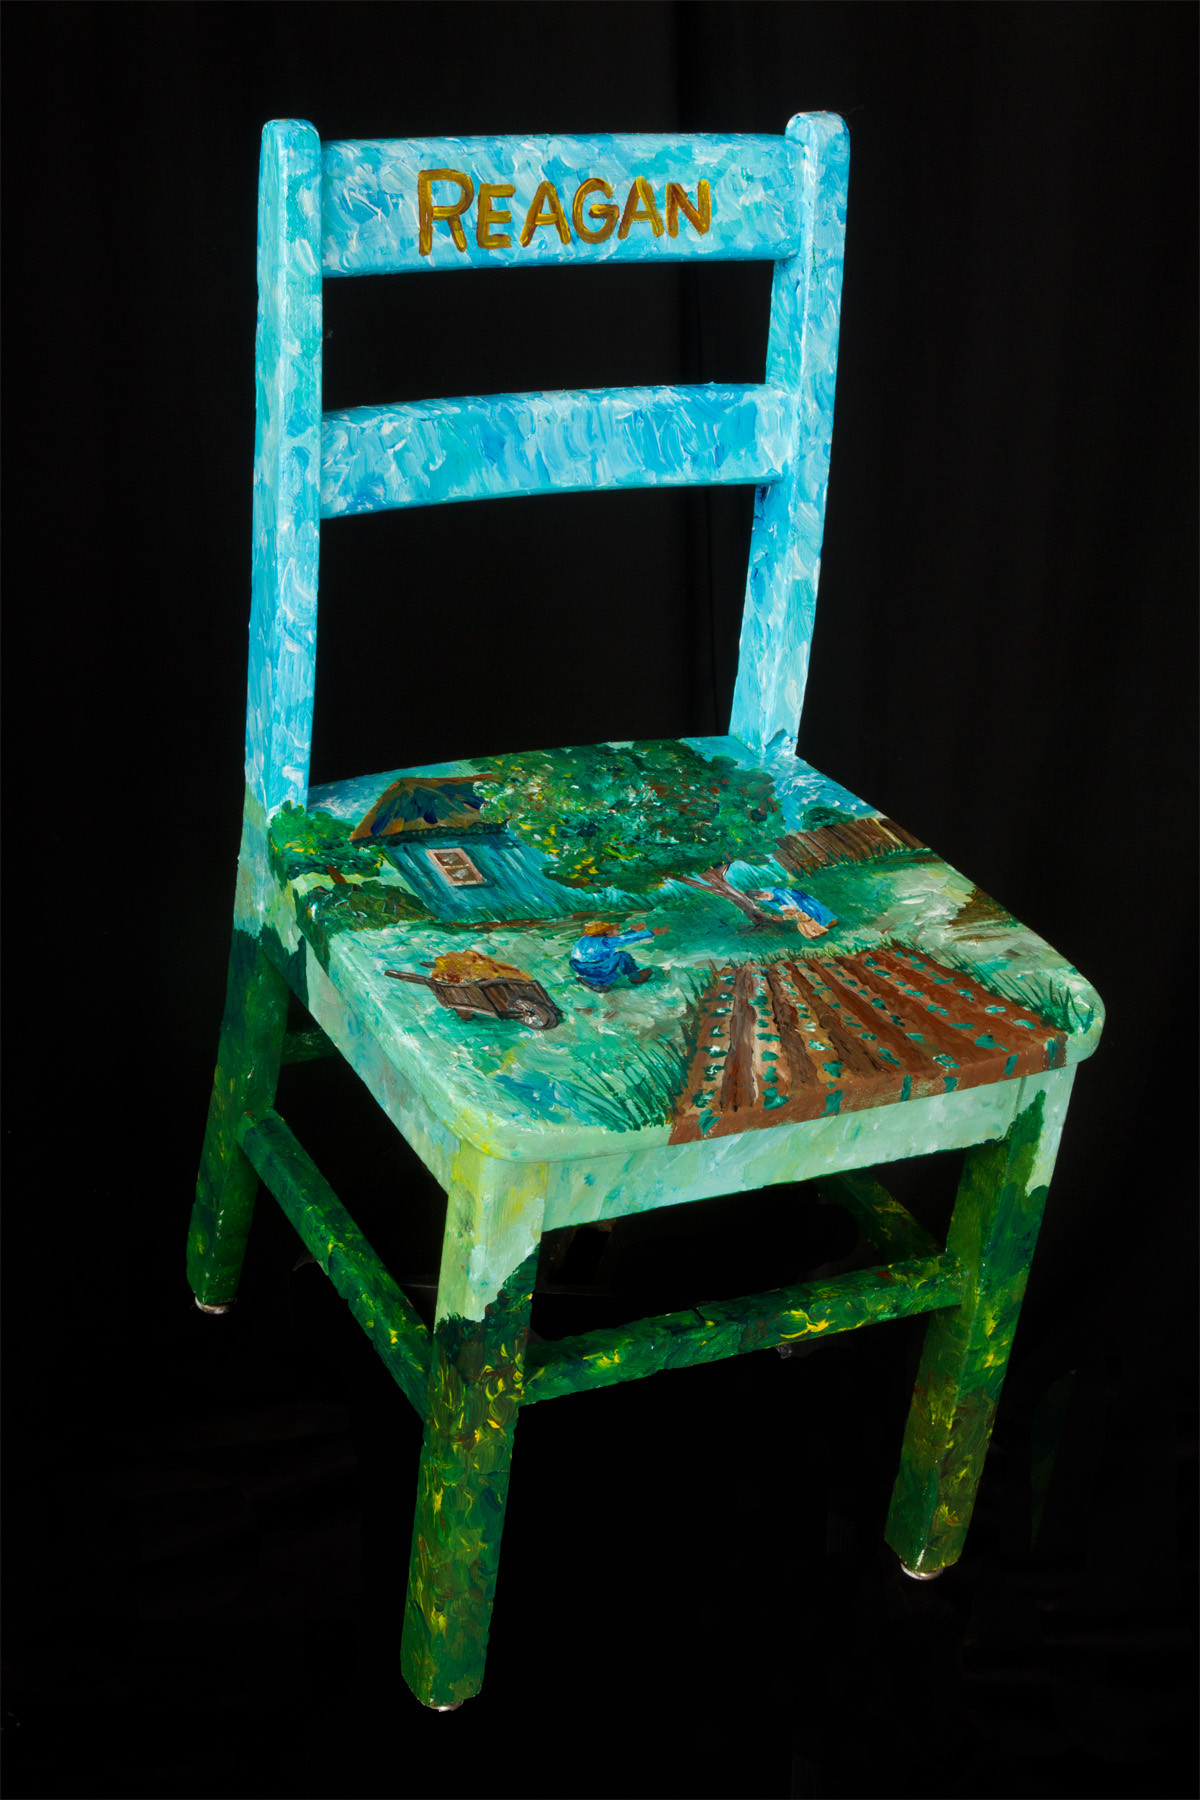 Chair_MG_4420 copy.jpg